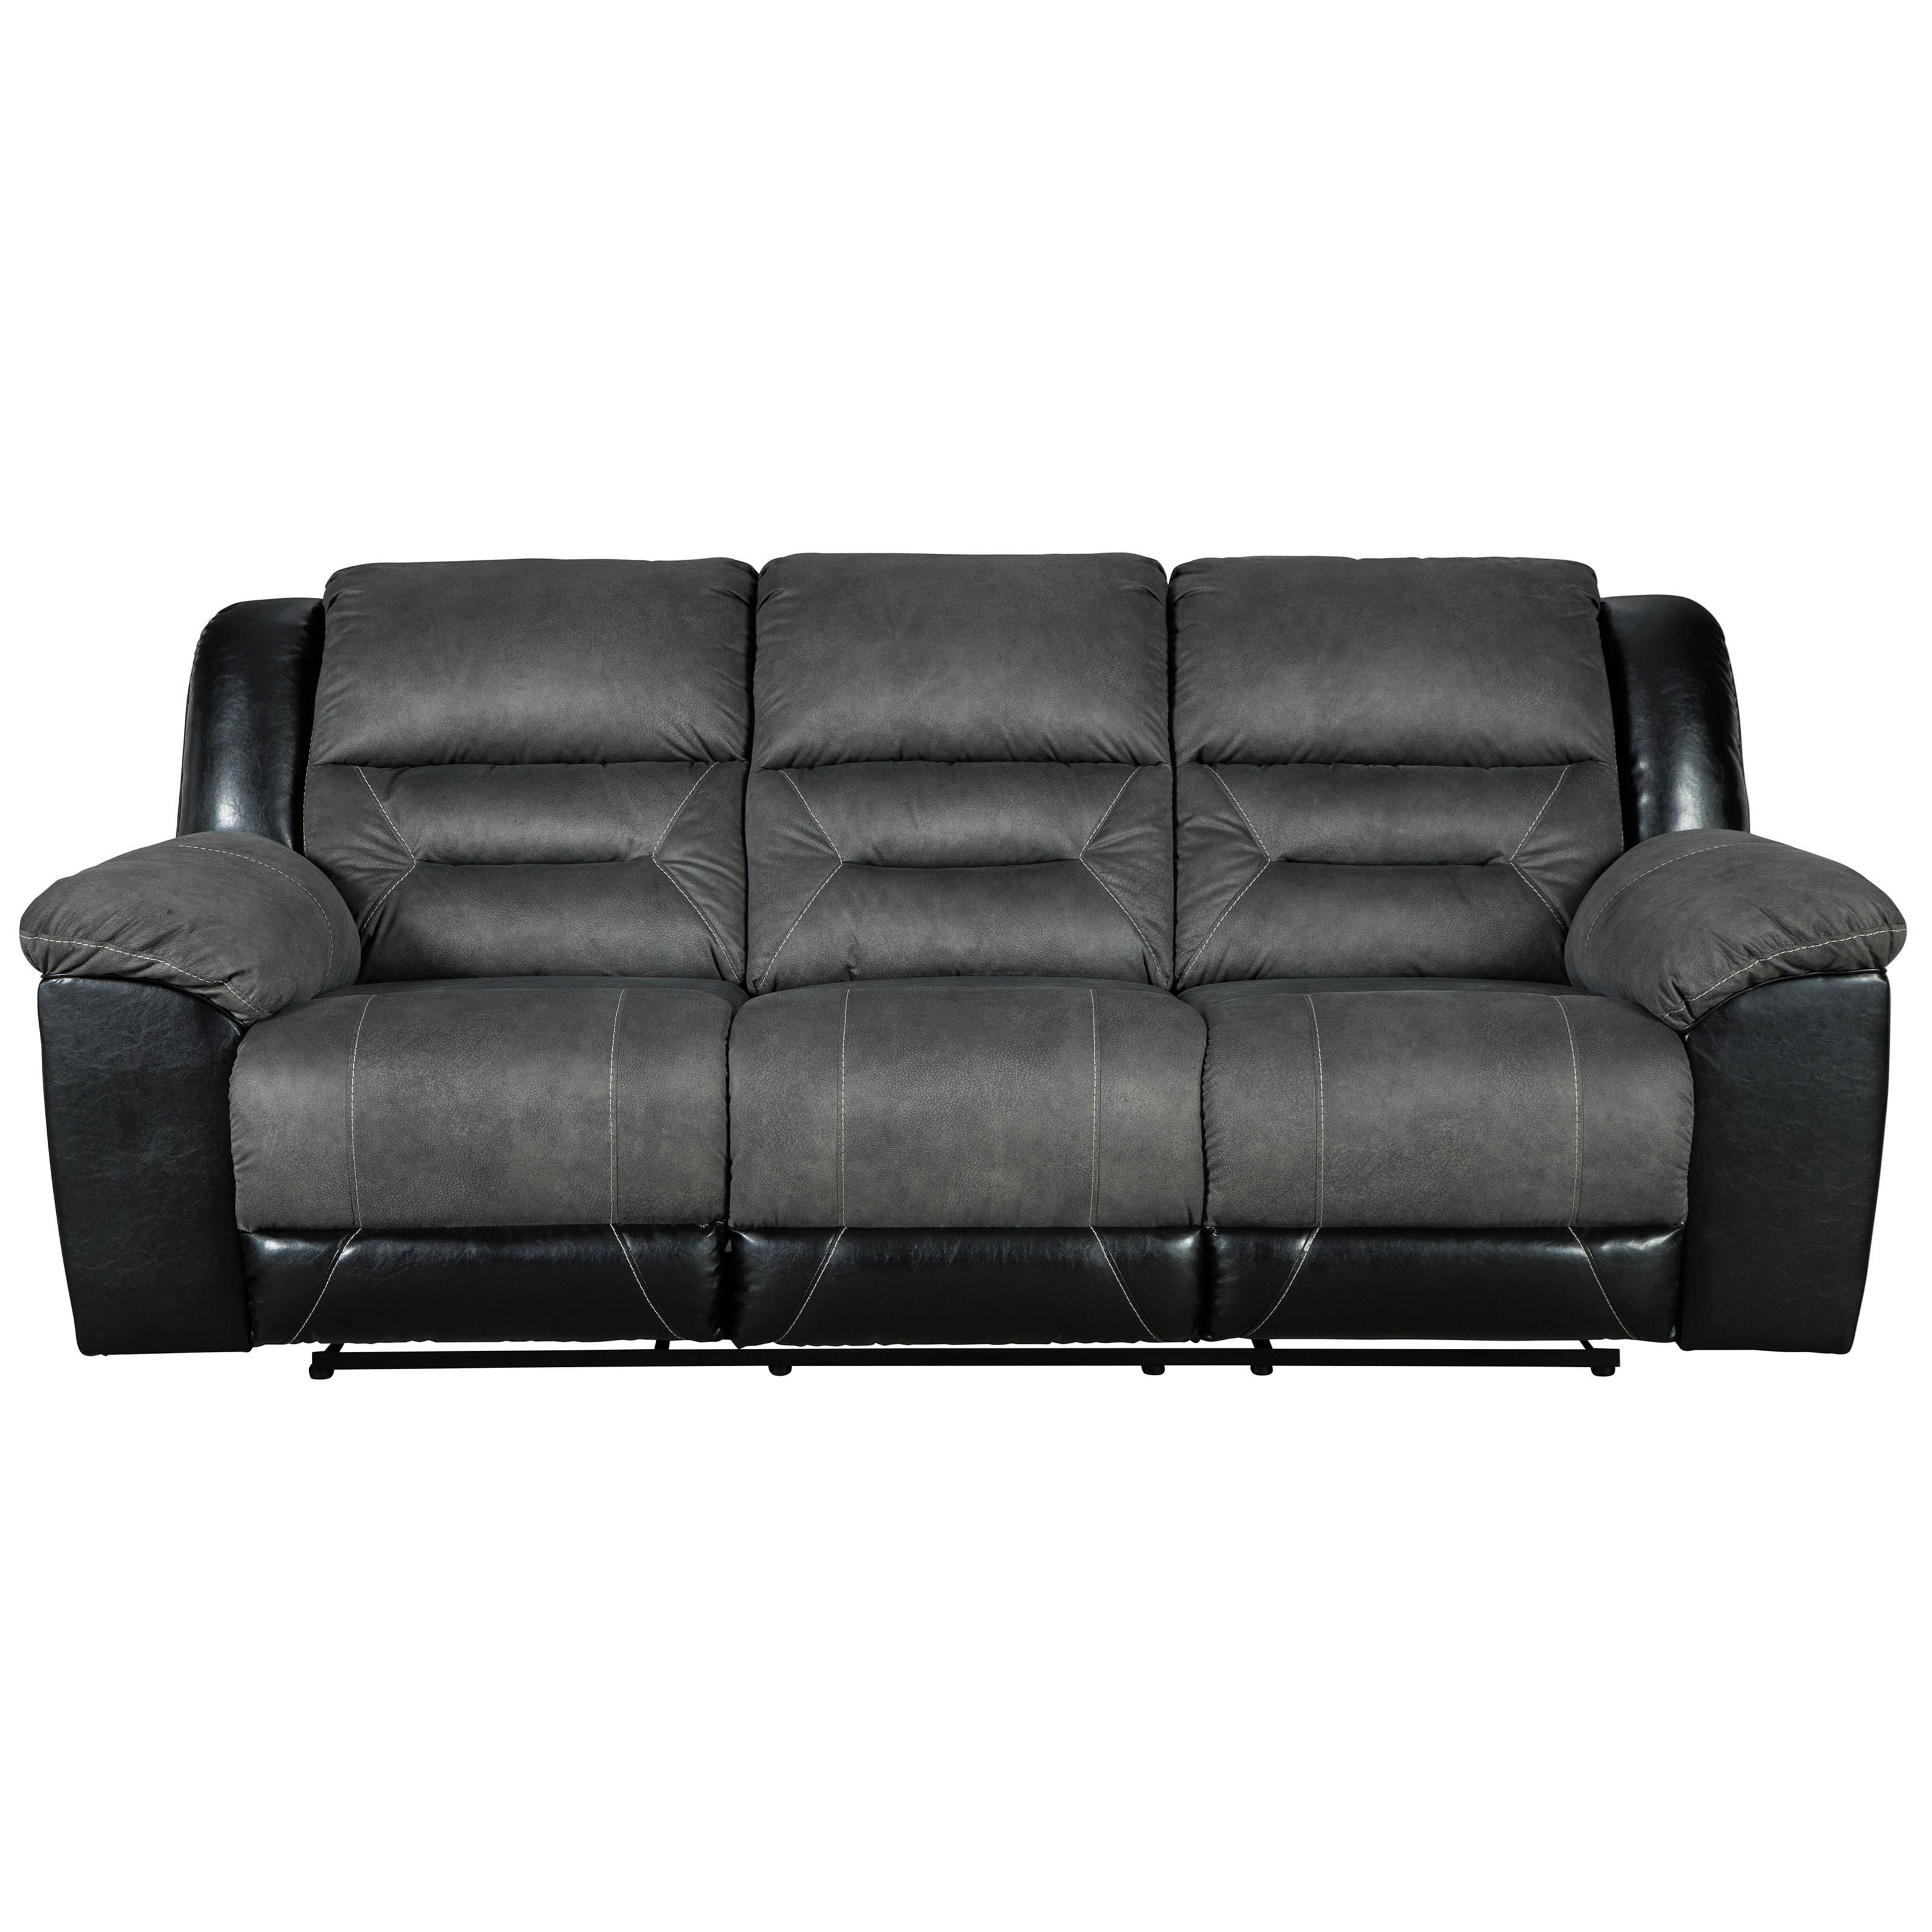 Earhart Reclining Sofa by Ashley (Signature Design) at Johnny Janosik